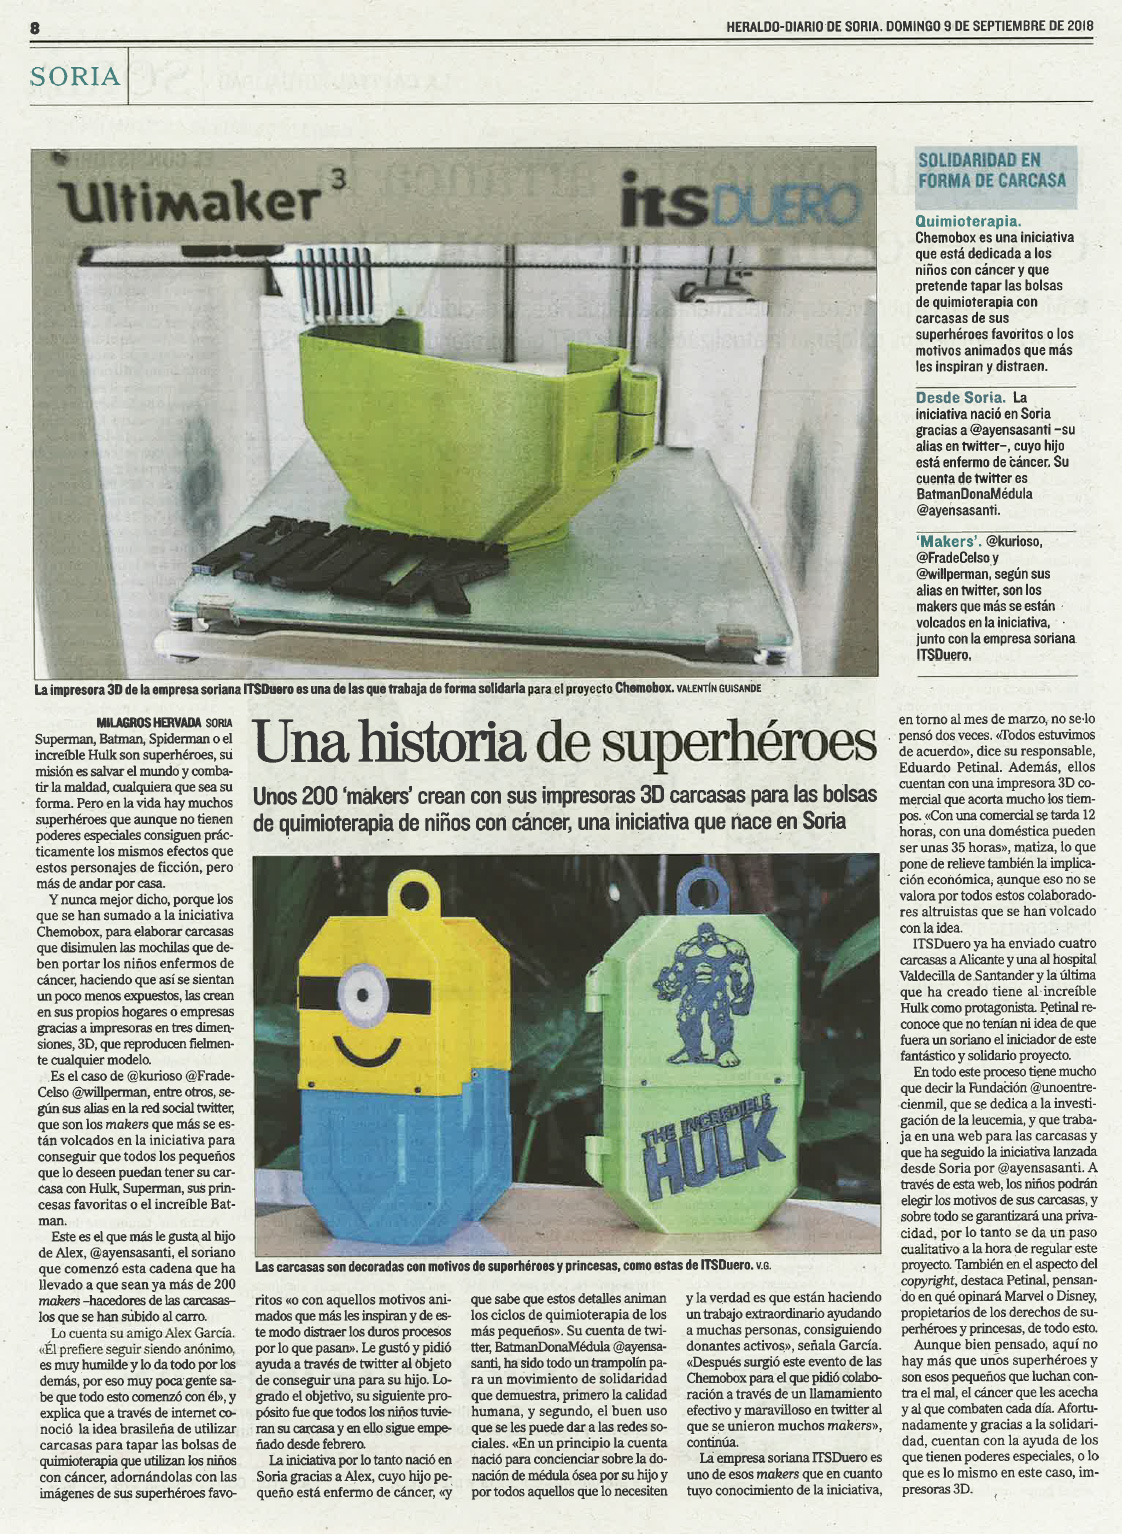 Reportaje ITS Duero Heraldo Diario de Soria